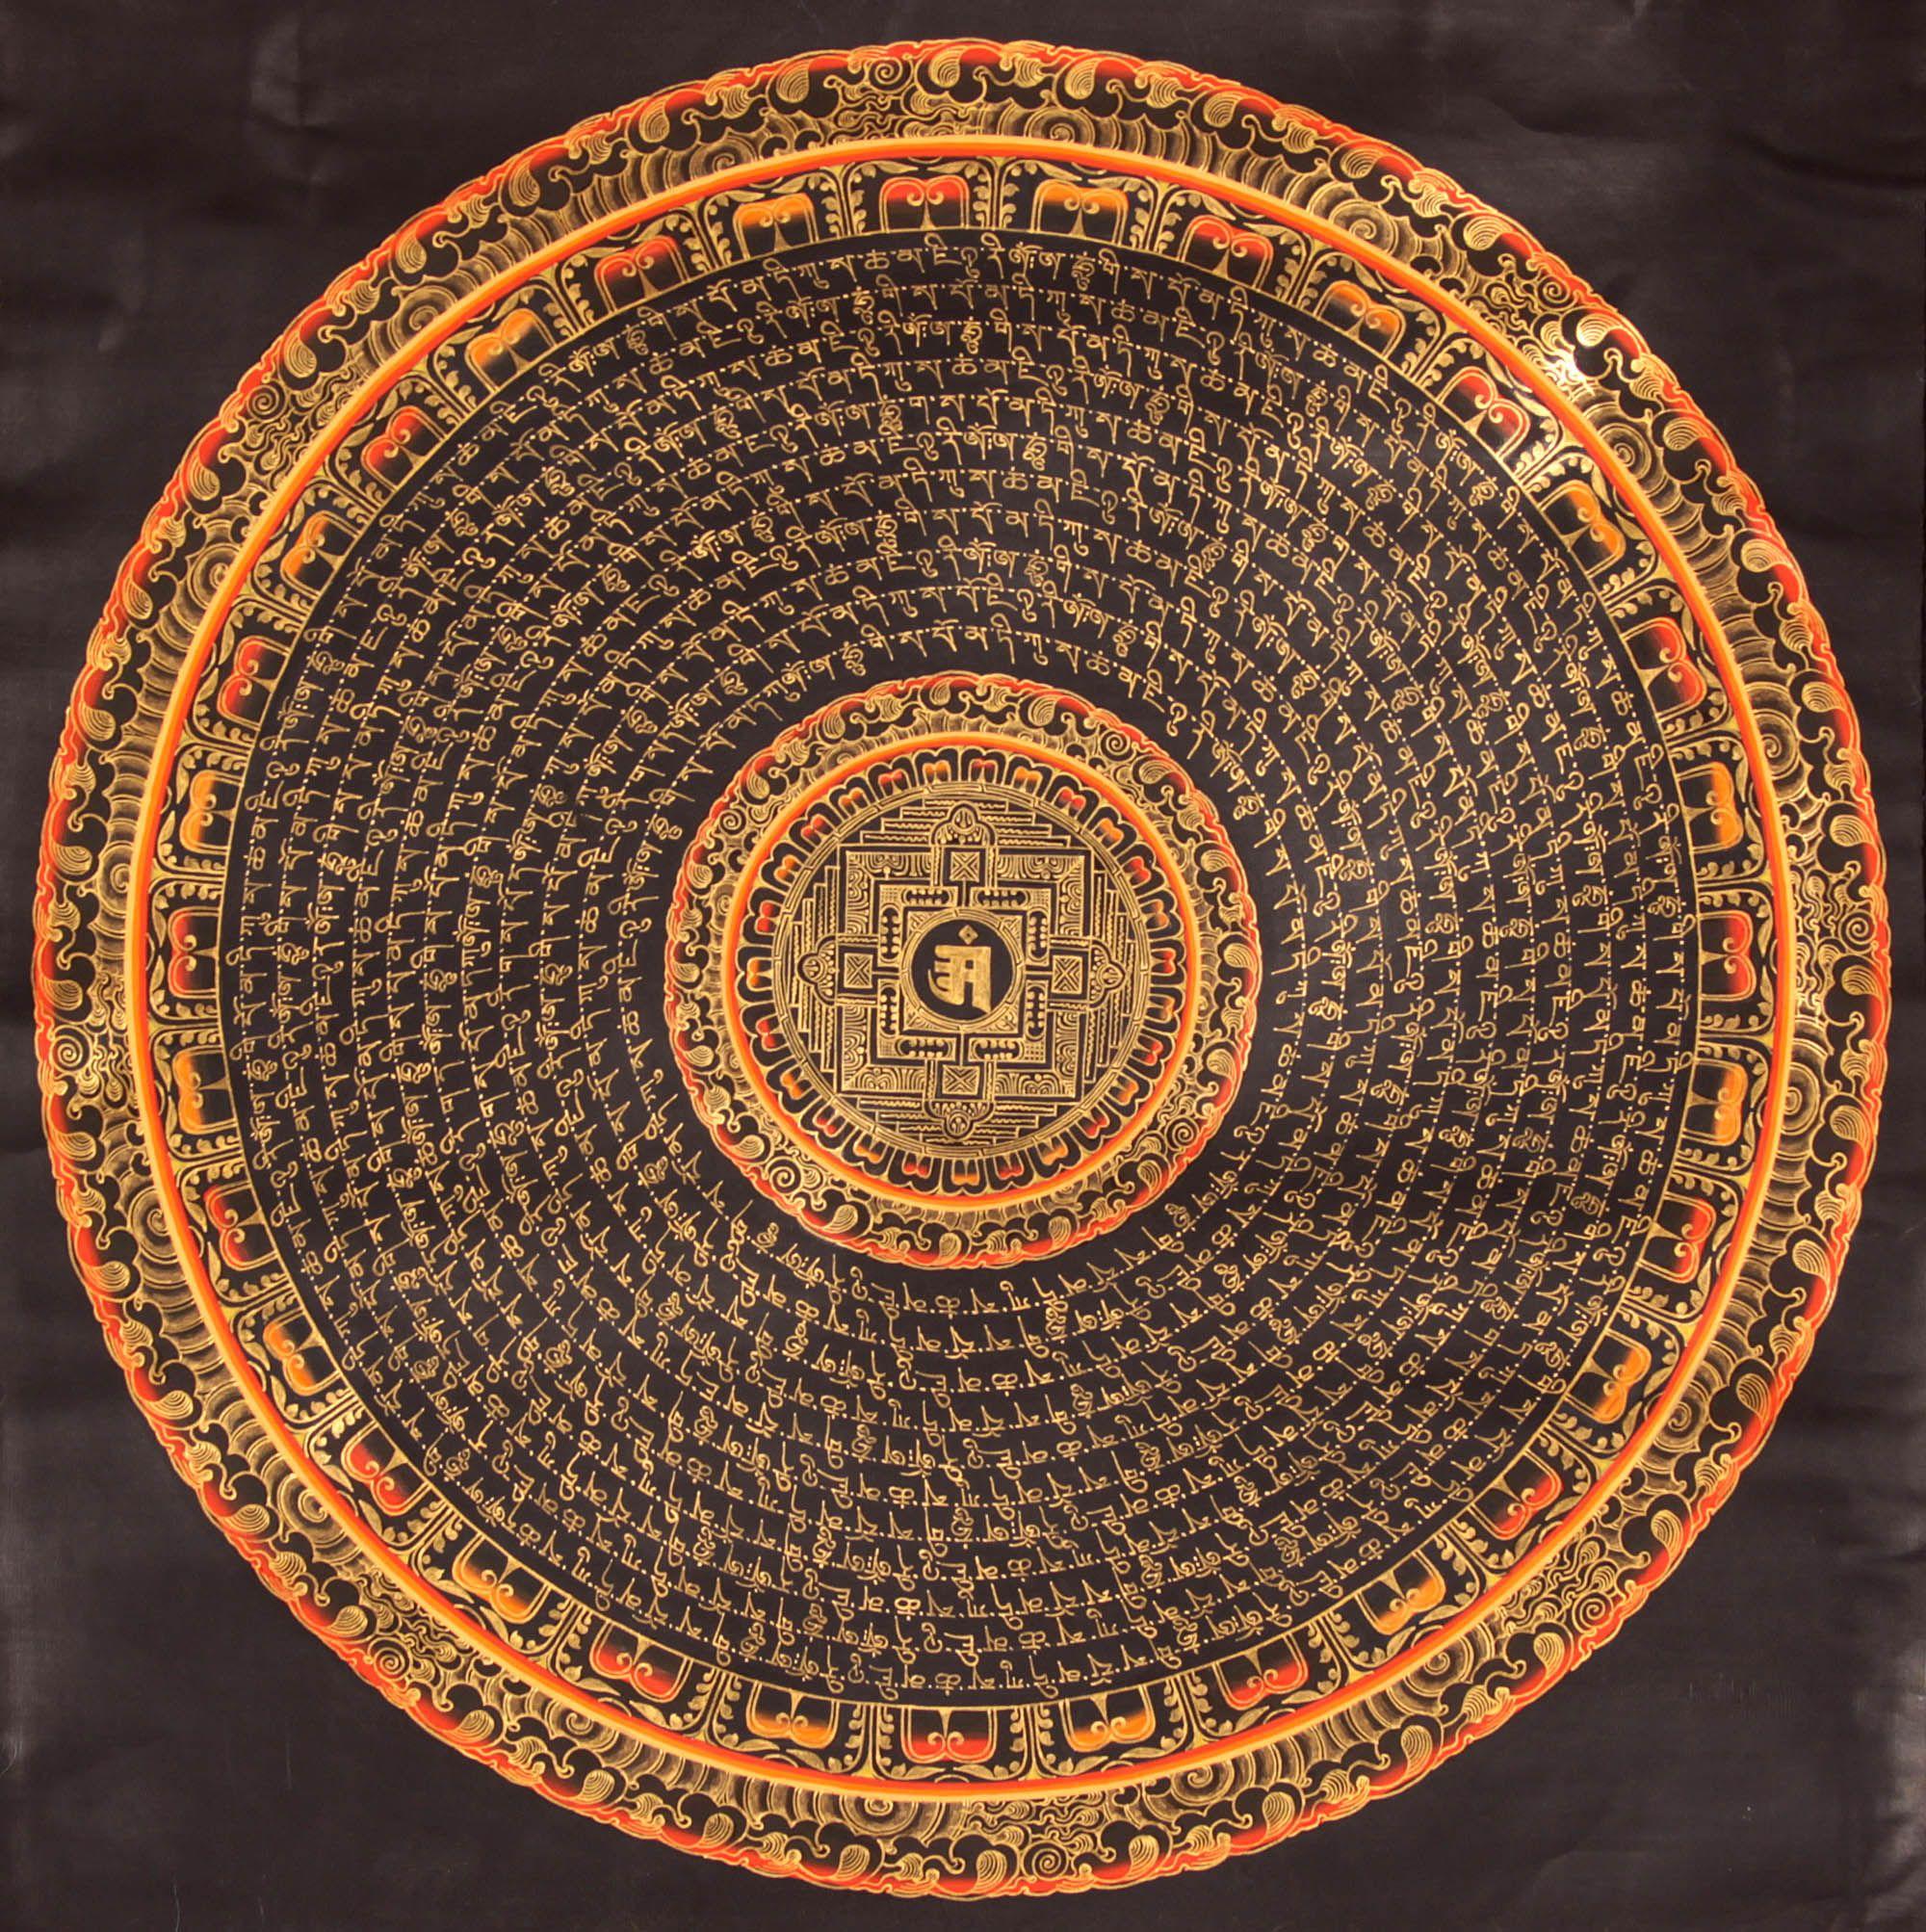 Tibetan Buddhist Mantra Mandala